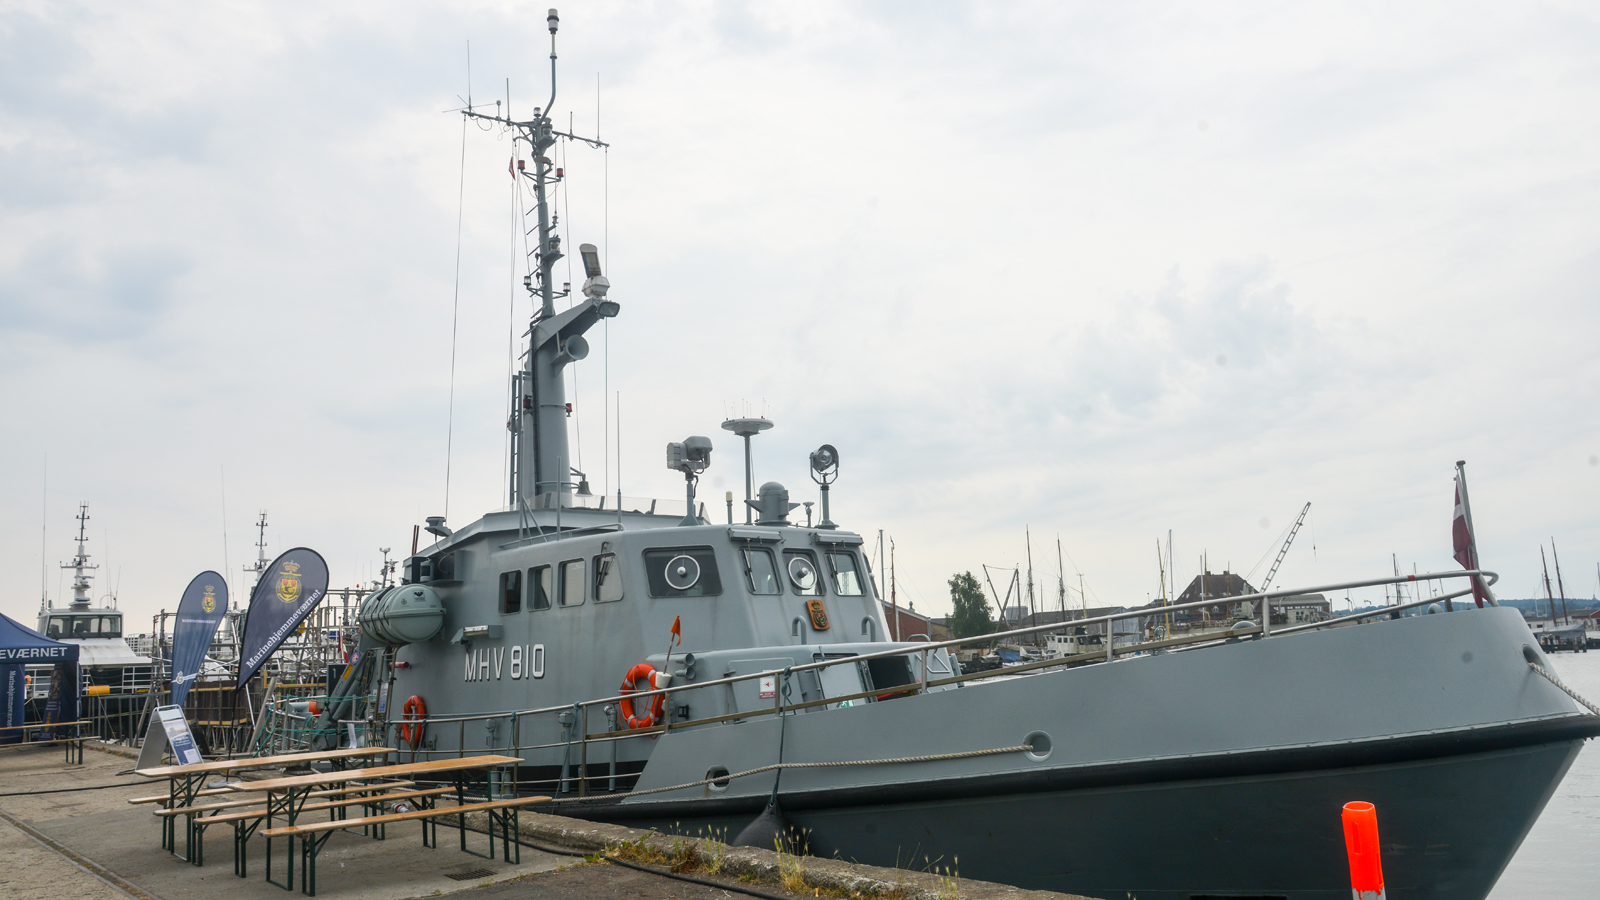 800_5376 - Marinefartøj